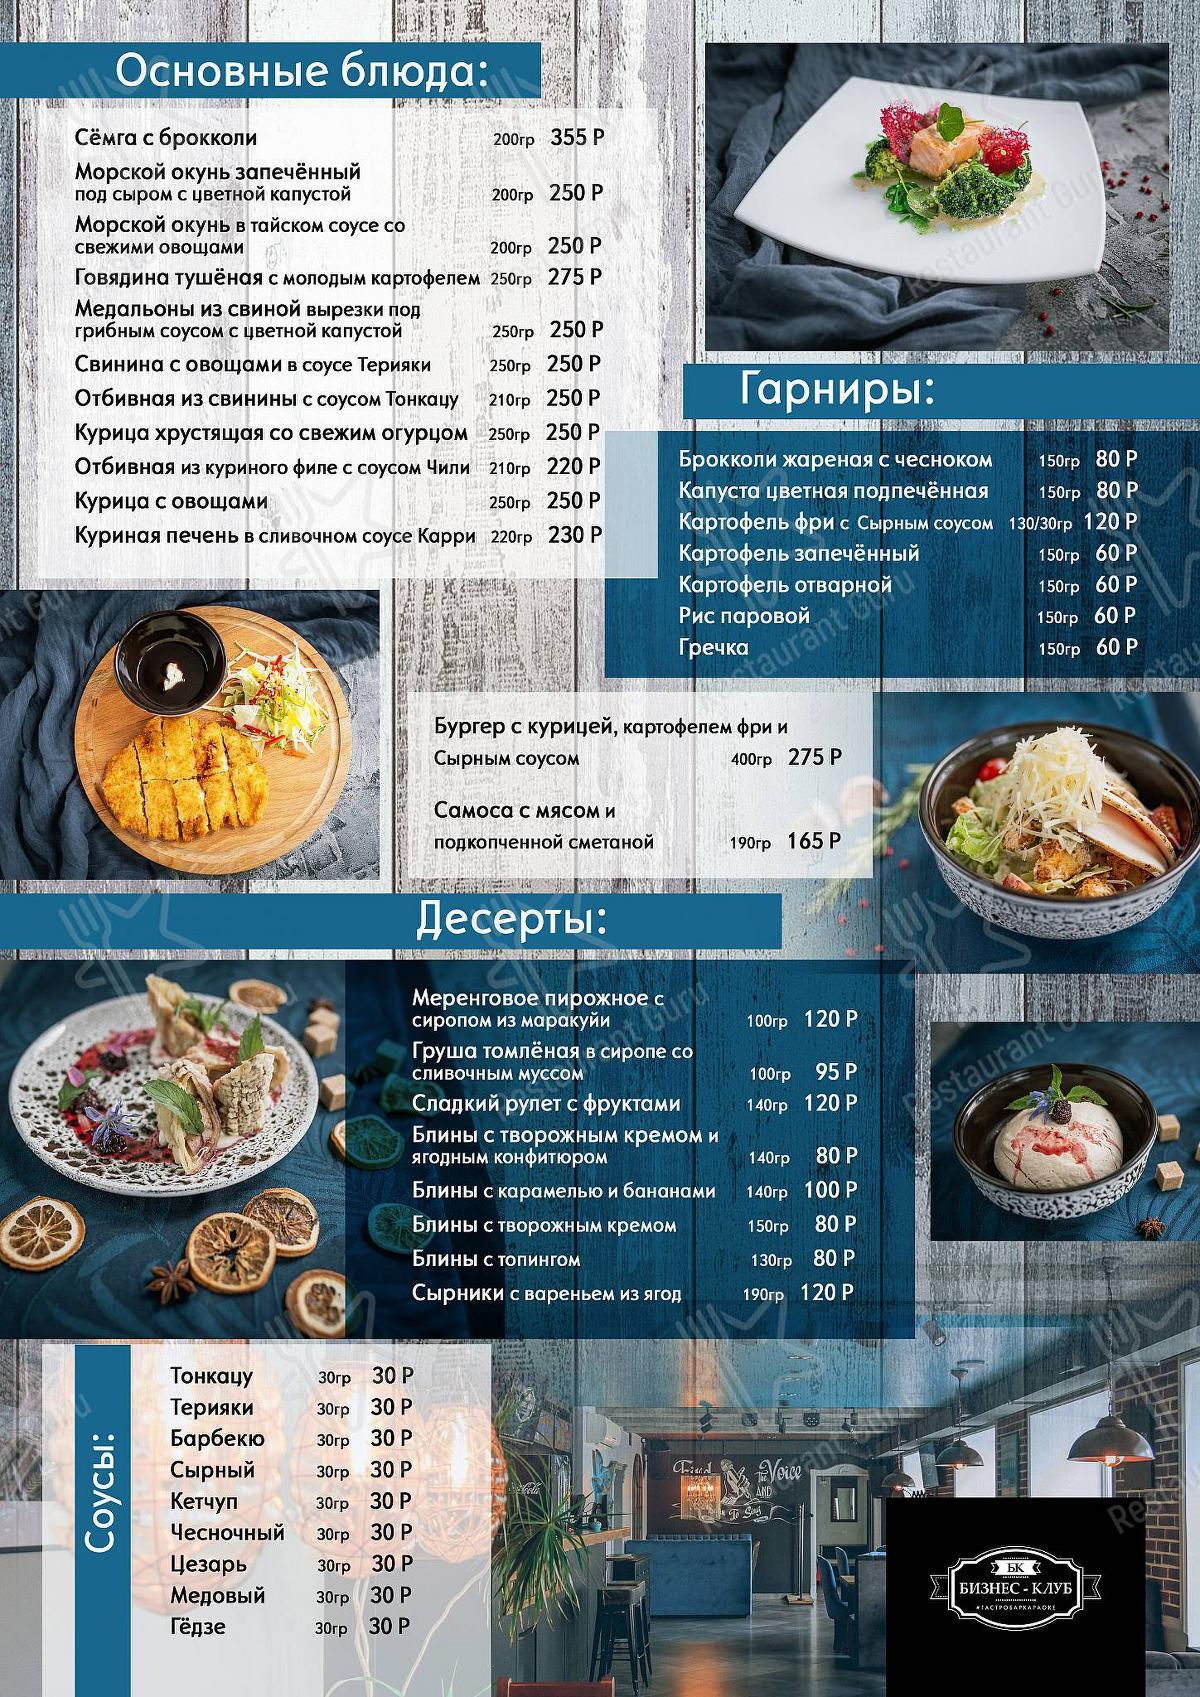 Меню ресторана Бизнес Клуб